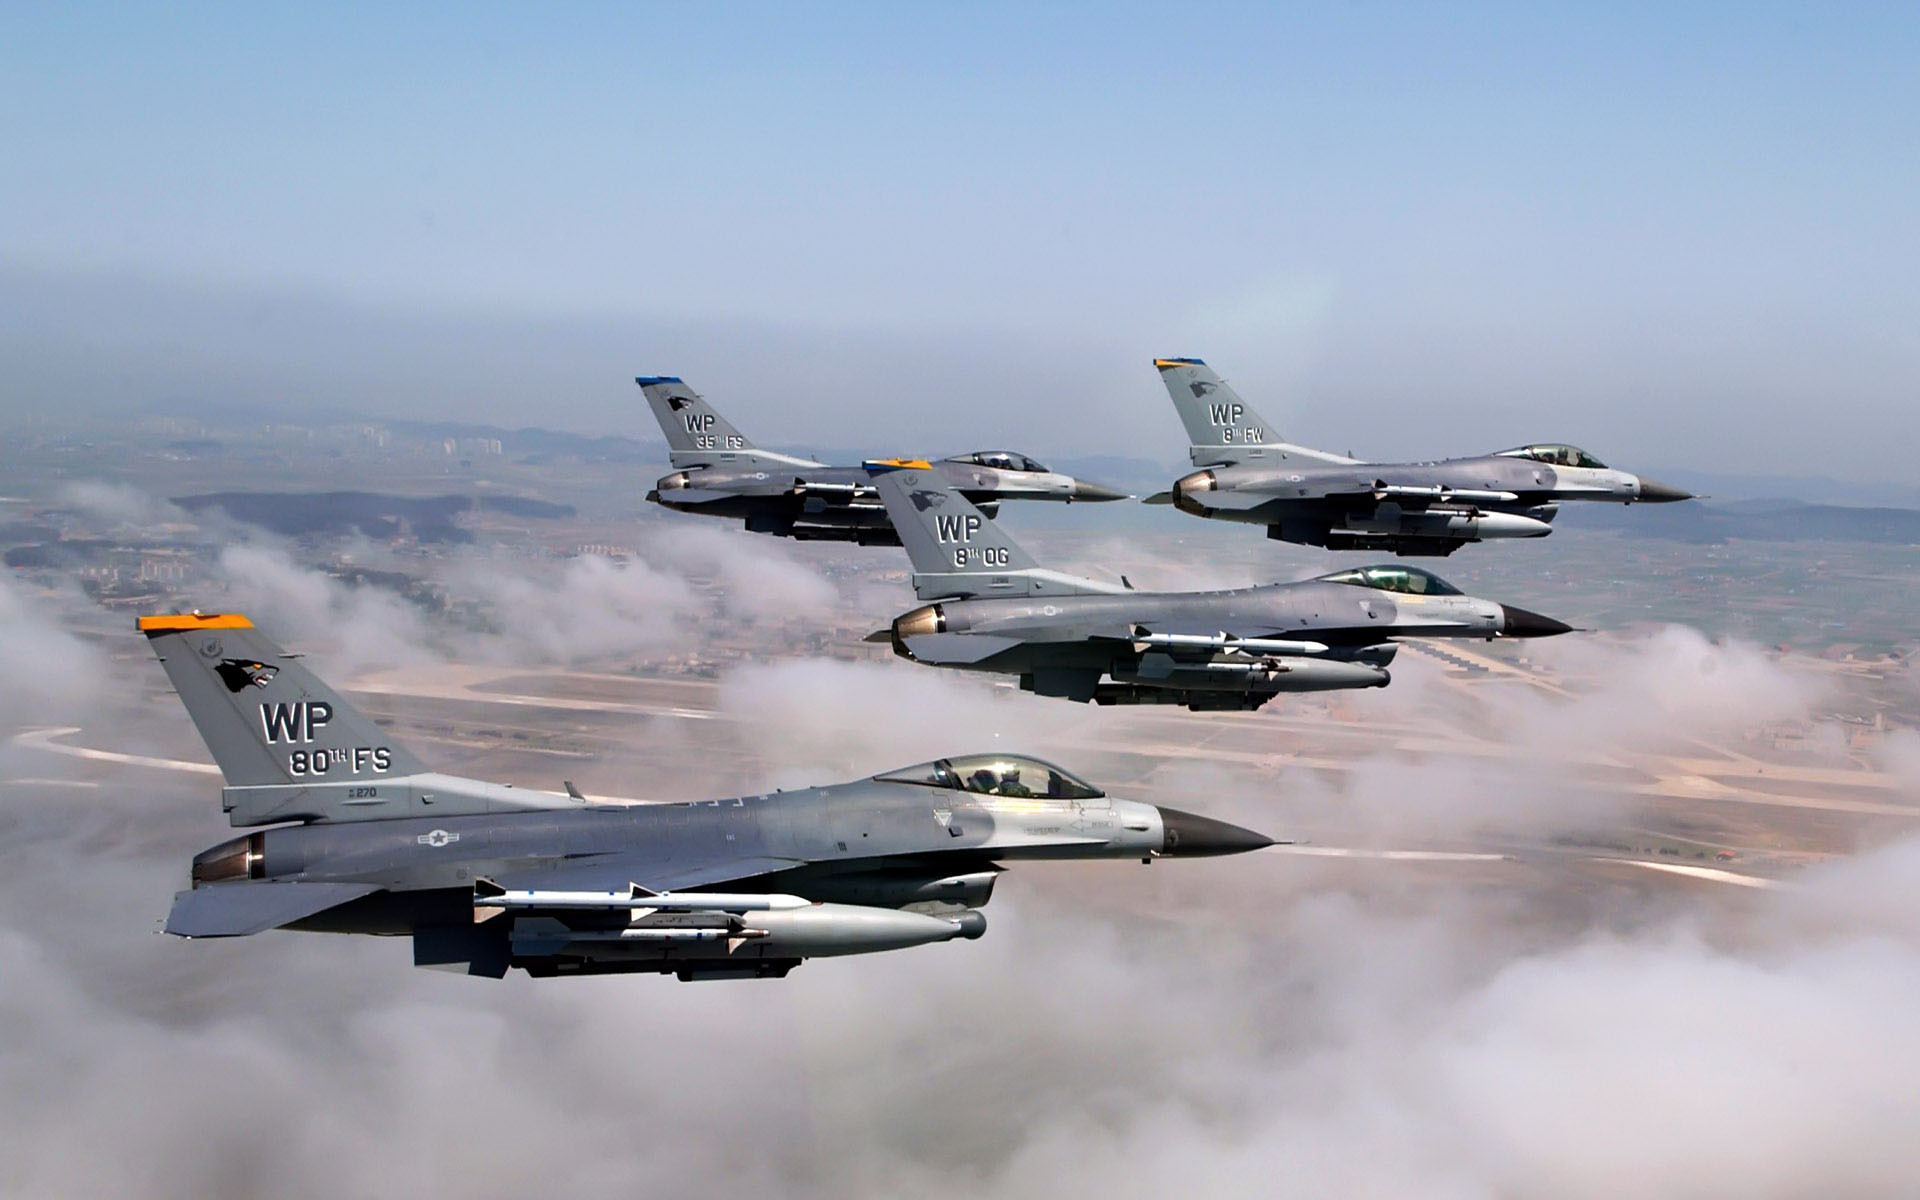 General Dynamics F-16 Fighting Falcon Squadron wallpaper